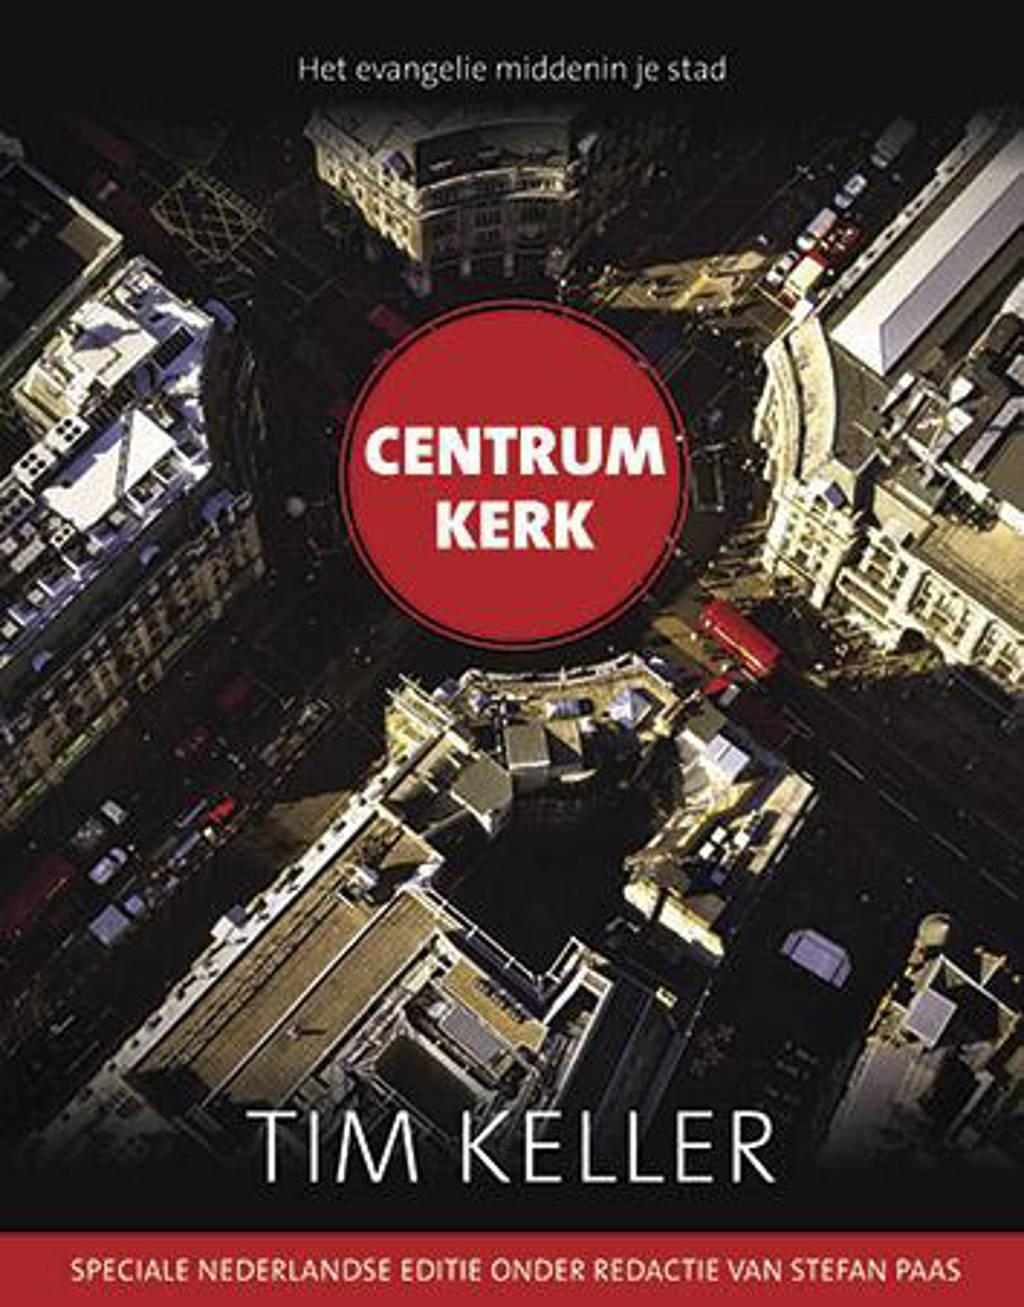 Centrum kerk - Tim Keller